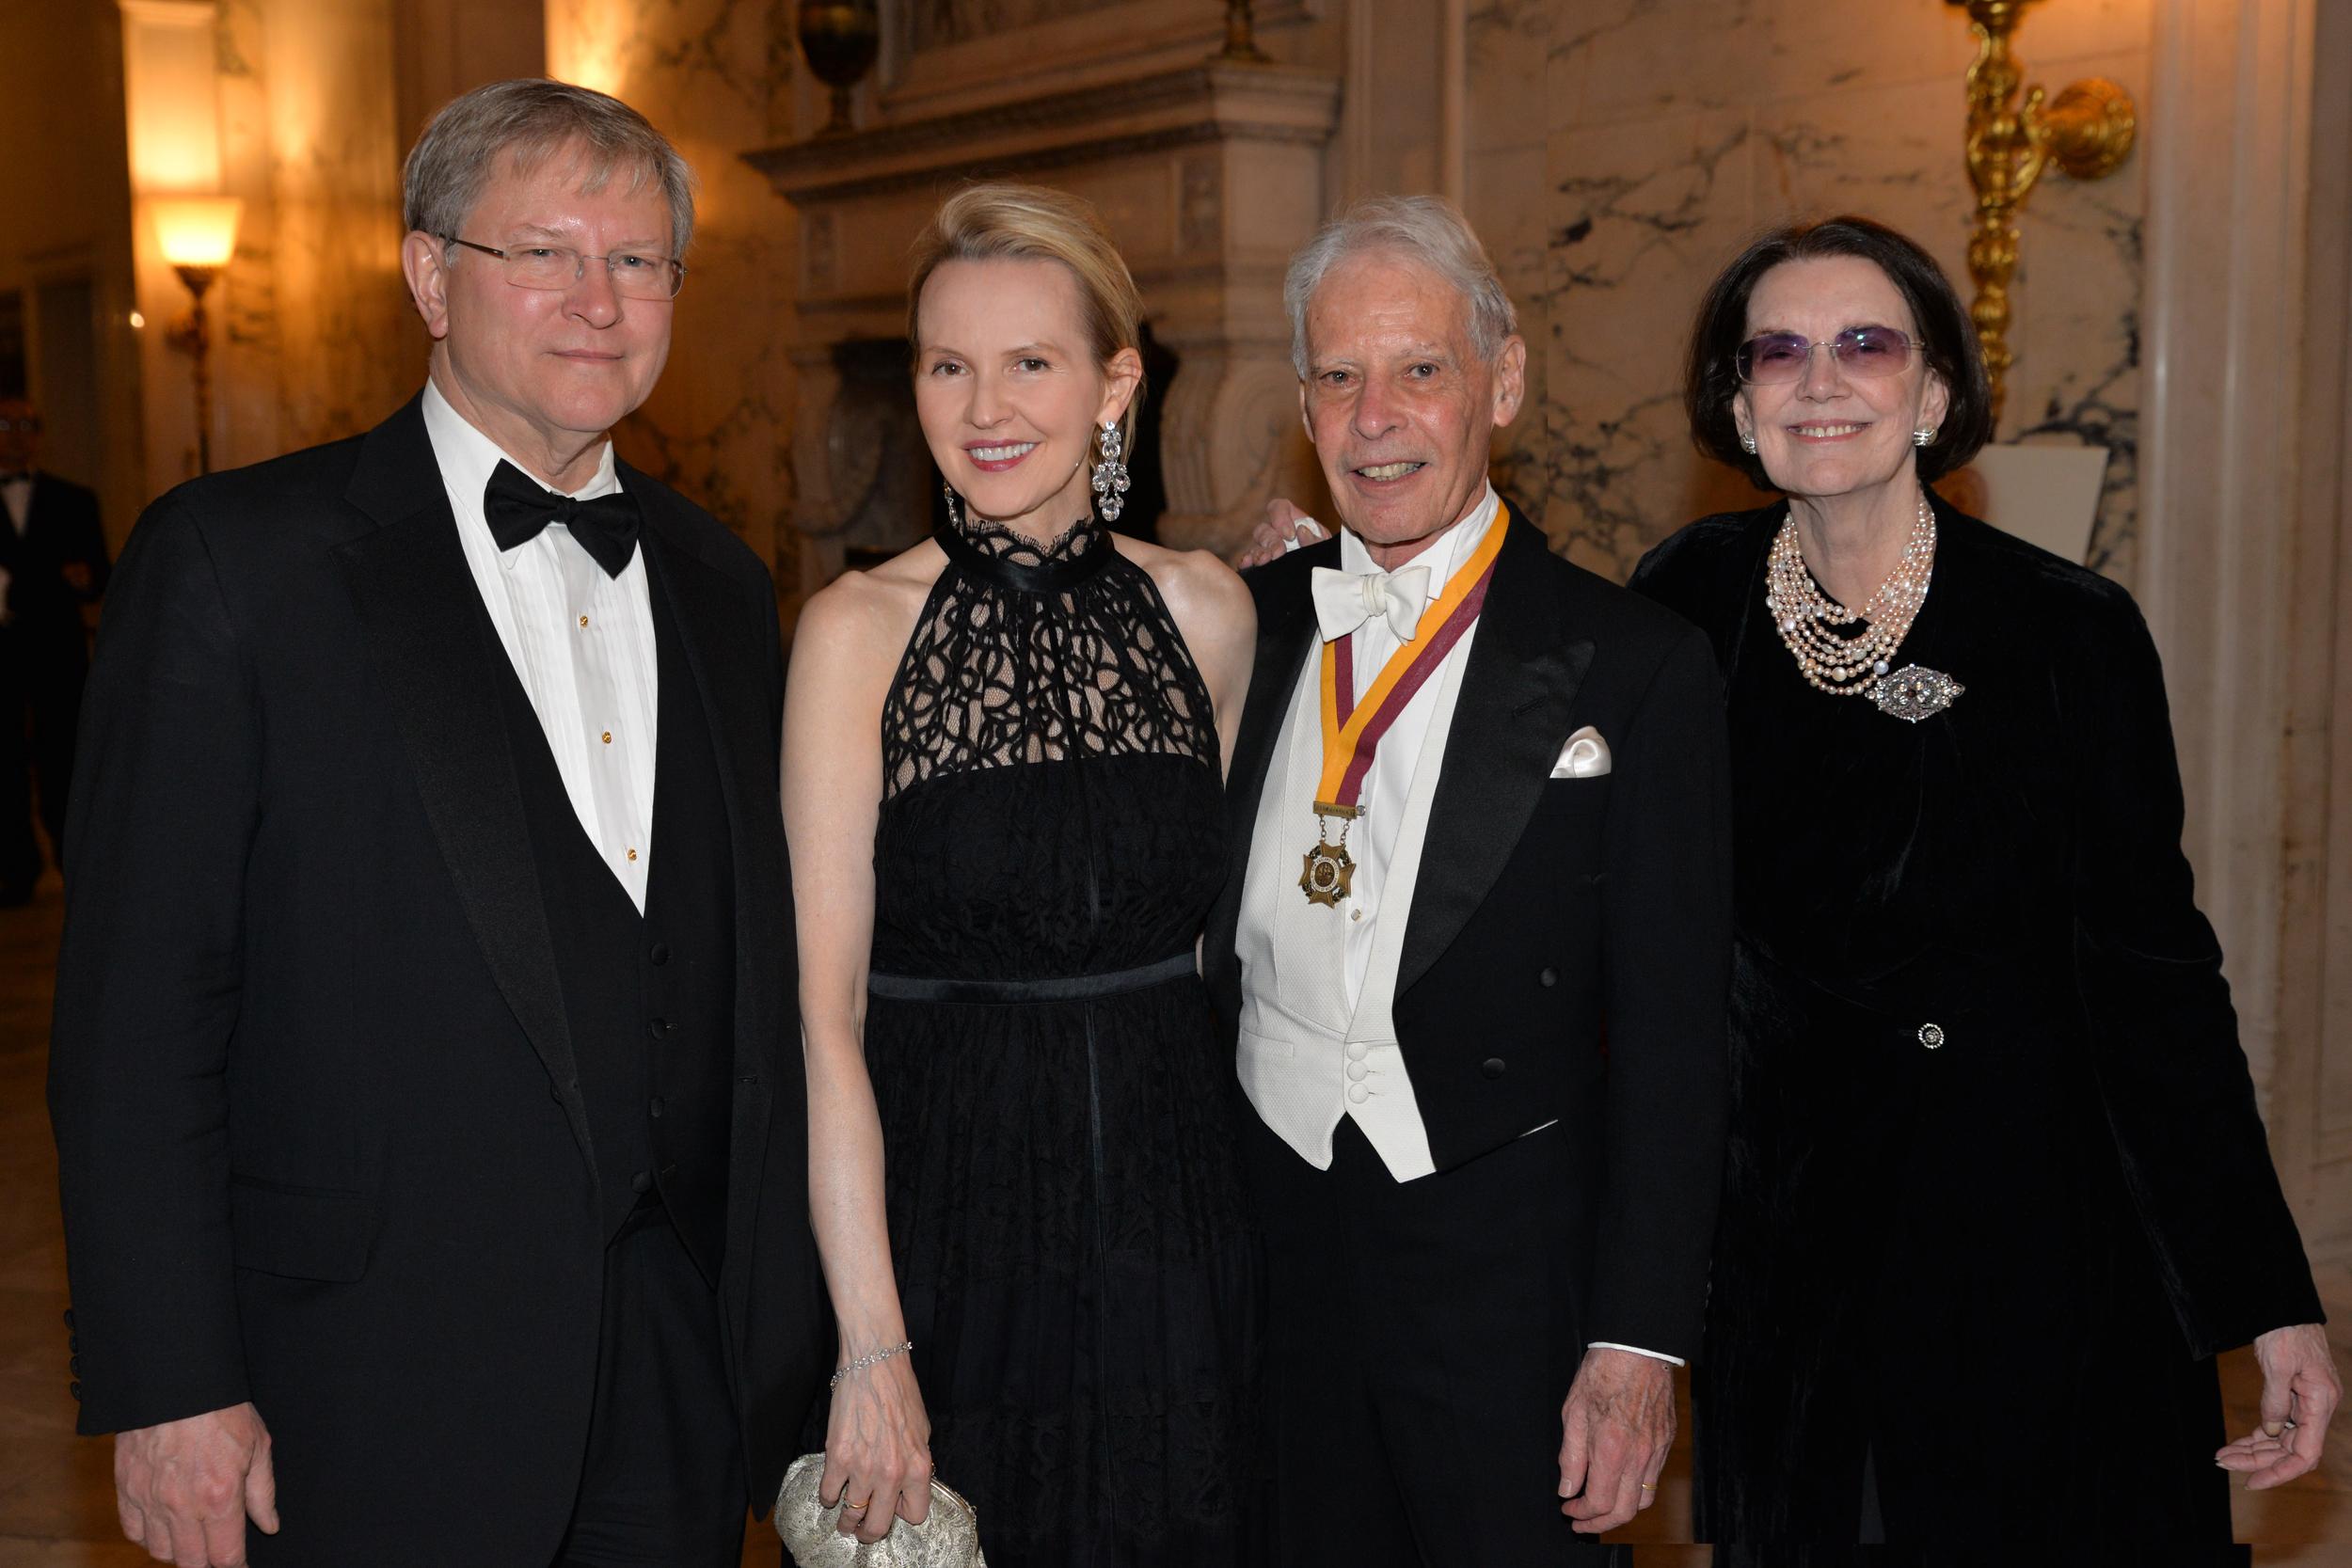 DSC_4071-Robert Morris, Hilda Neis, Arnold Neis, Connie Greenspan.JPG